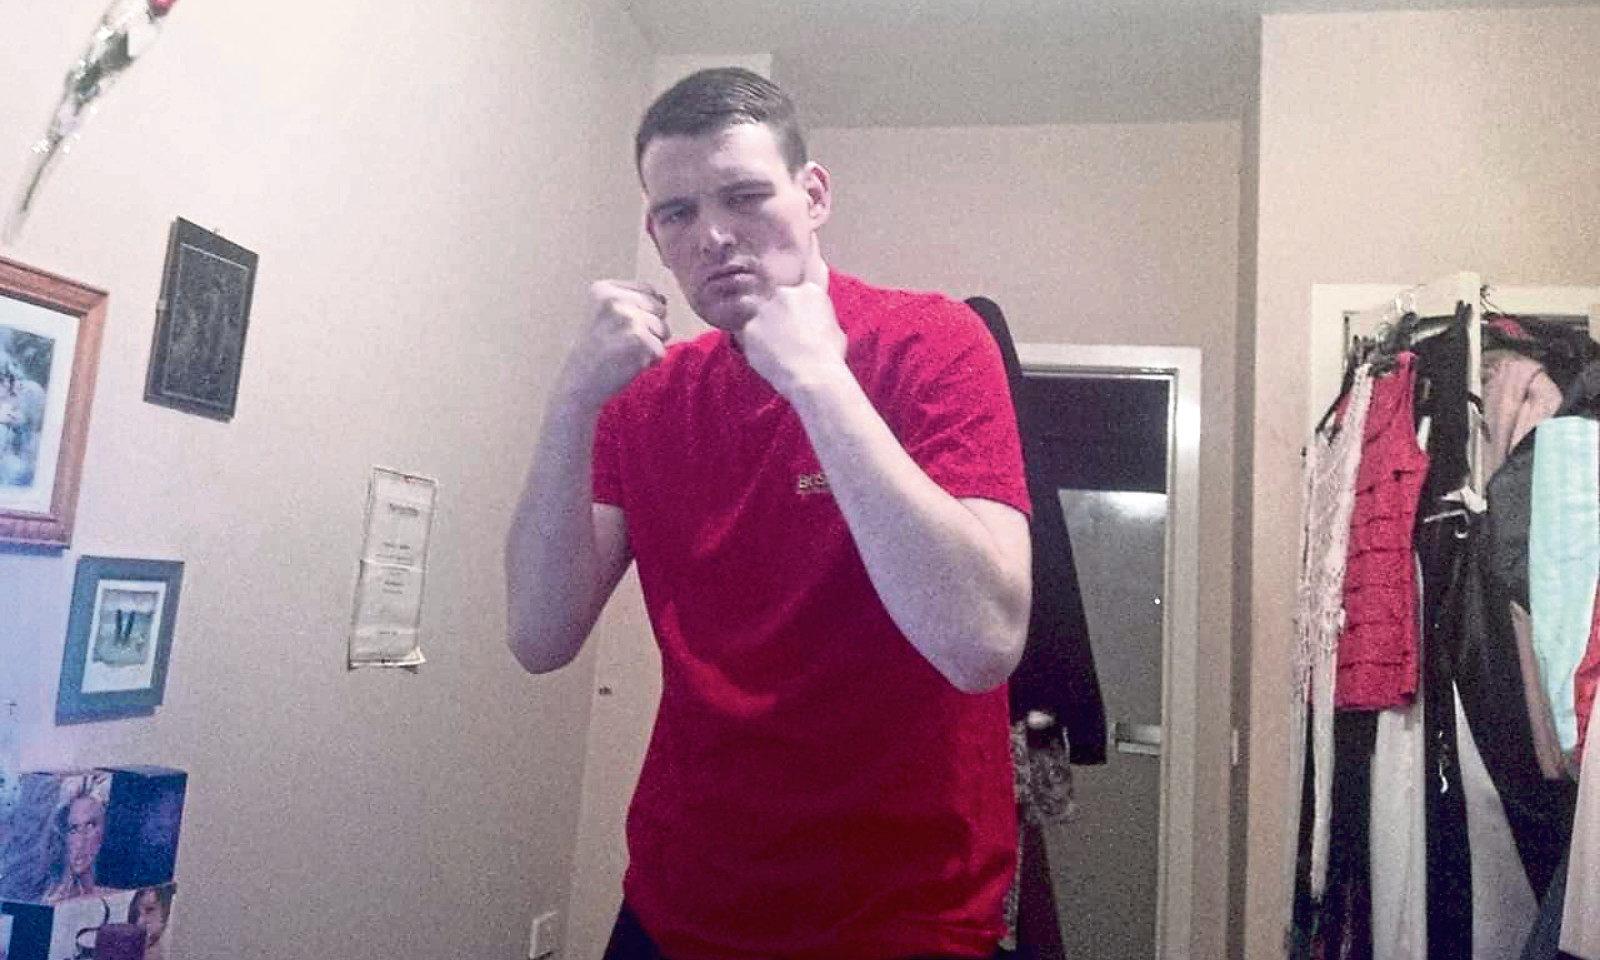 Chris Wilkie threatened to slash his victim's throat.